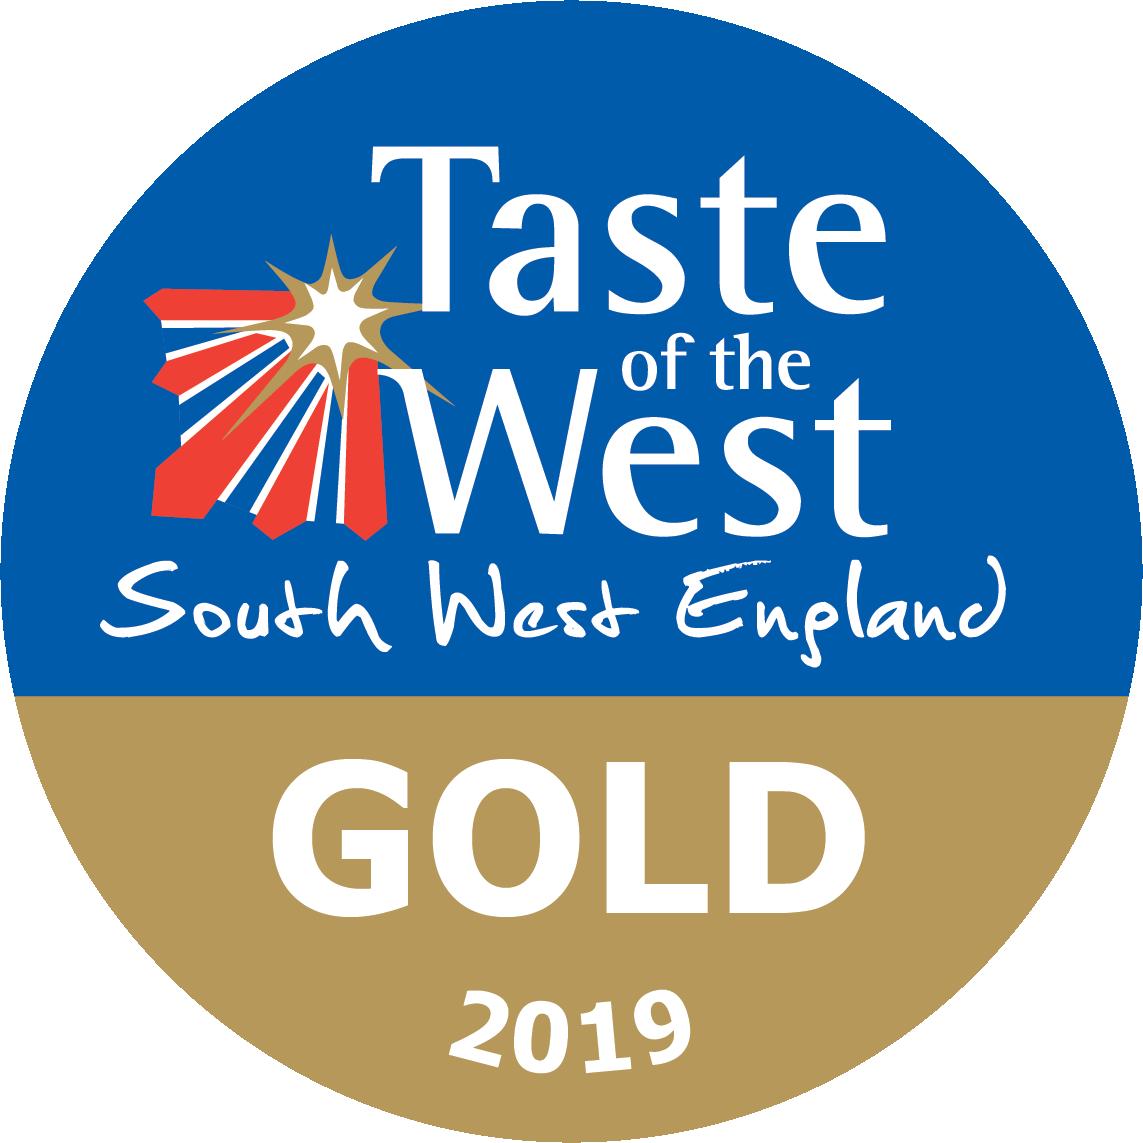 totw-gold-2019.png